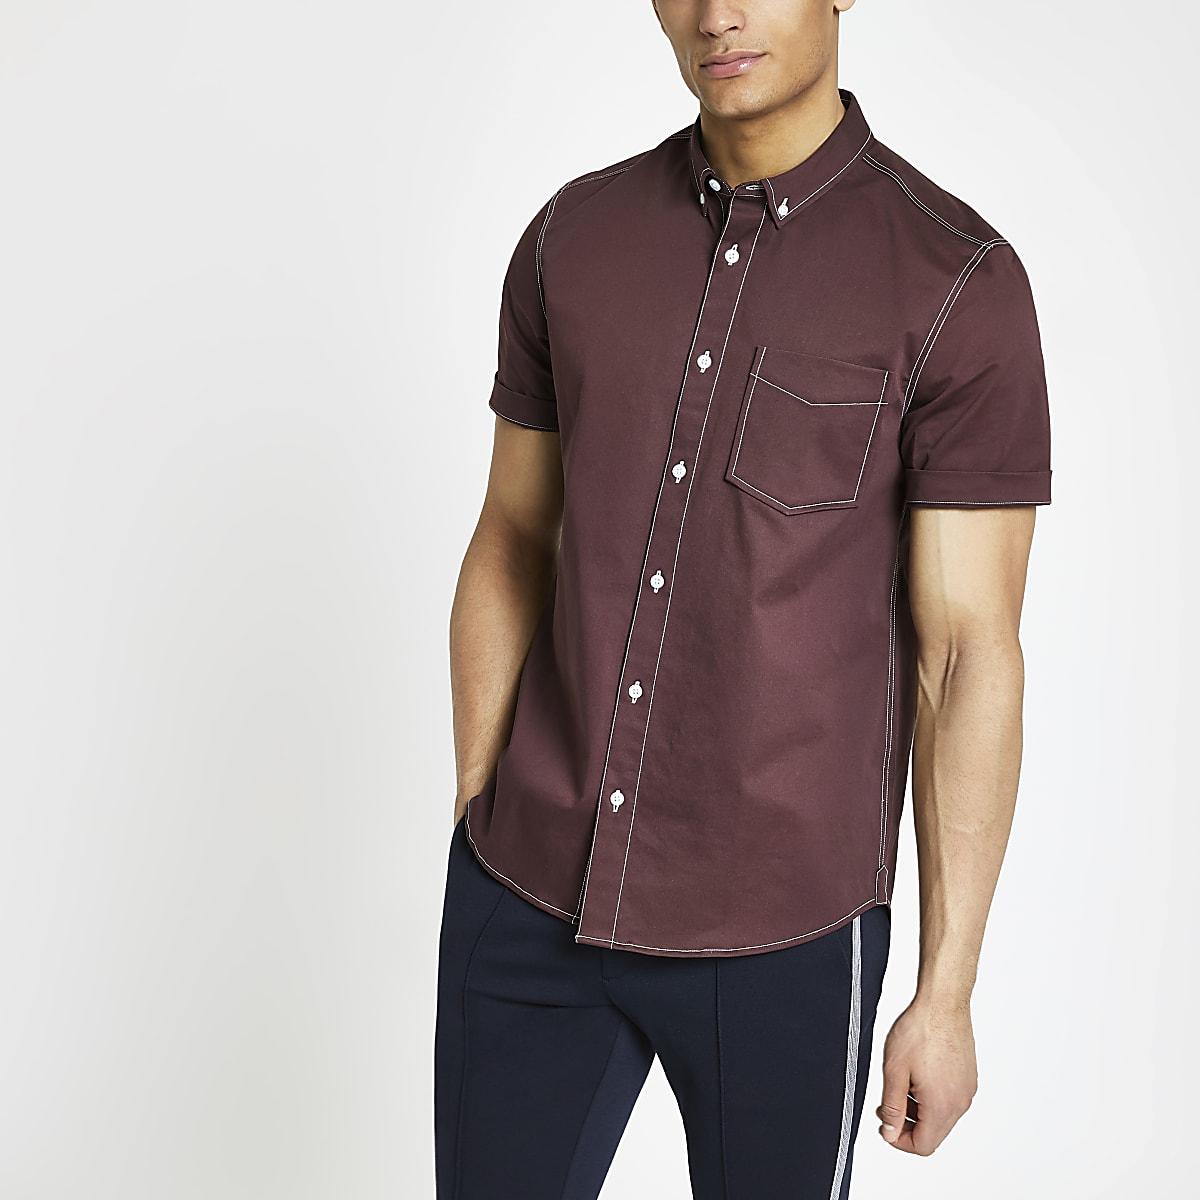 Burgundy twill stitch short sleeve shirt